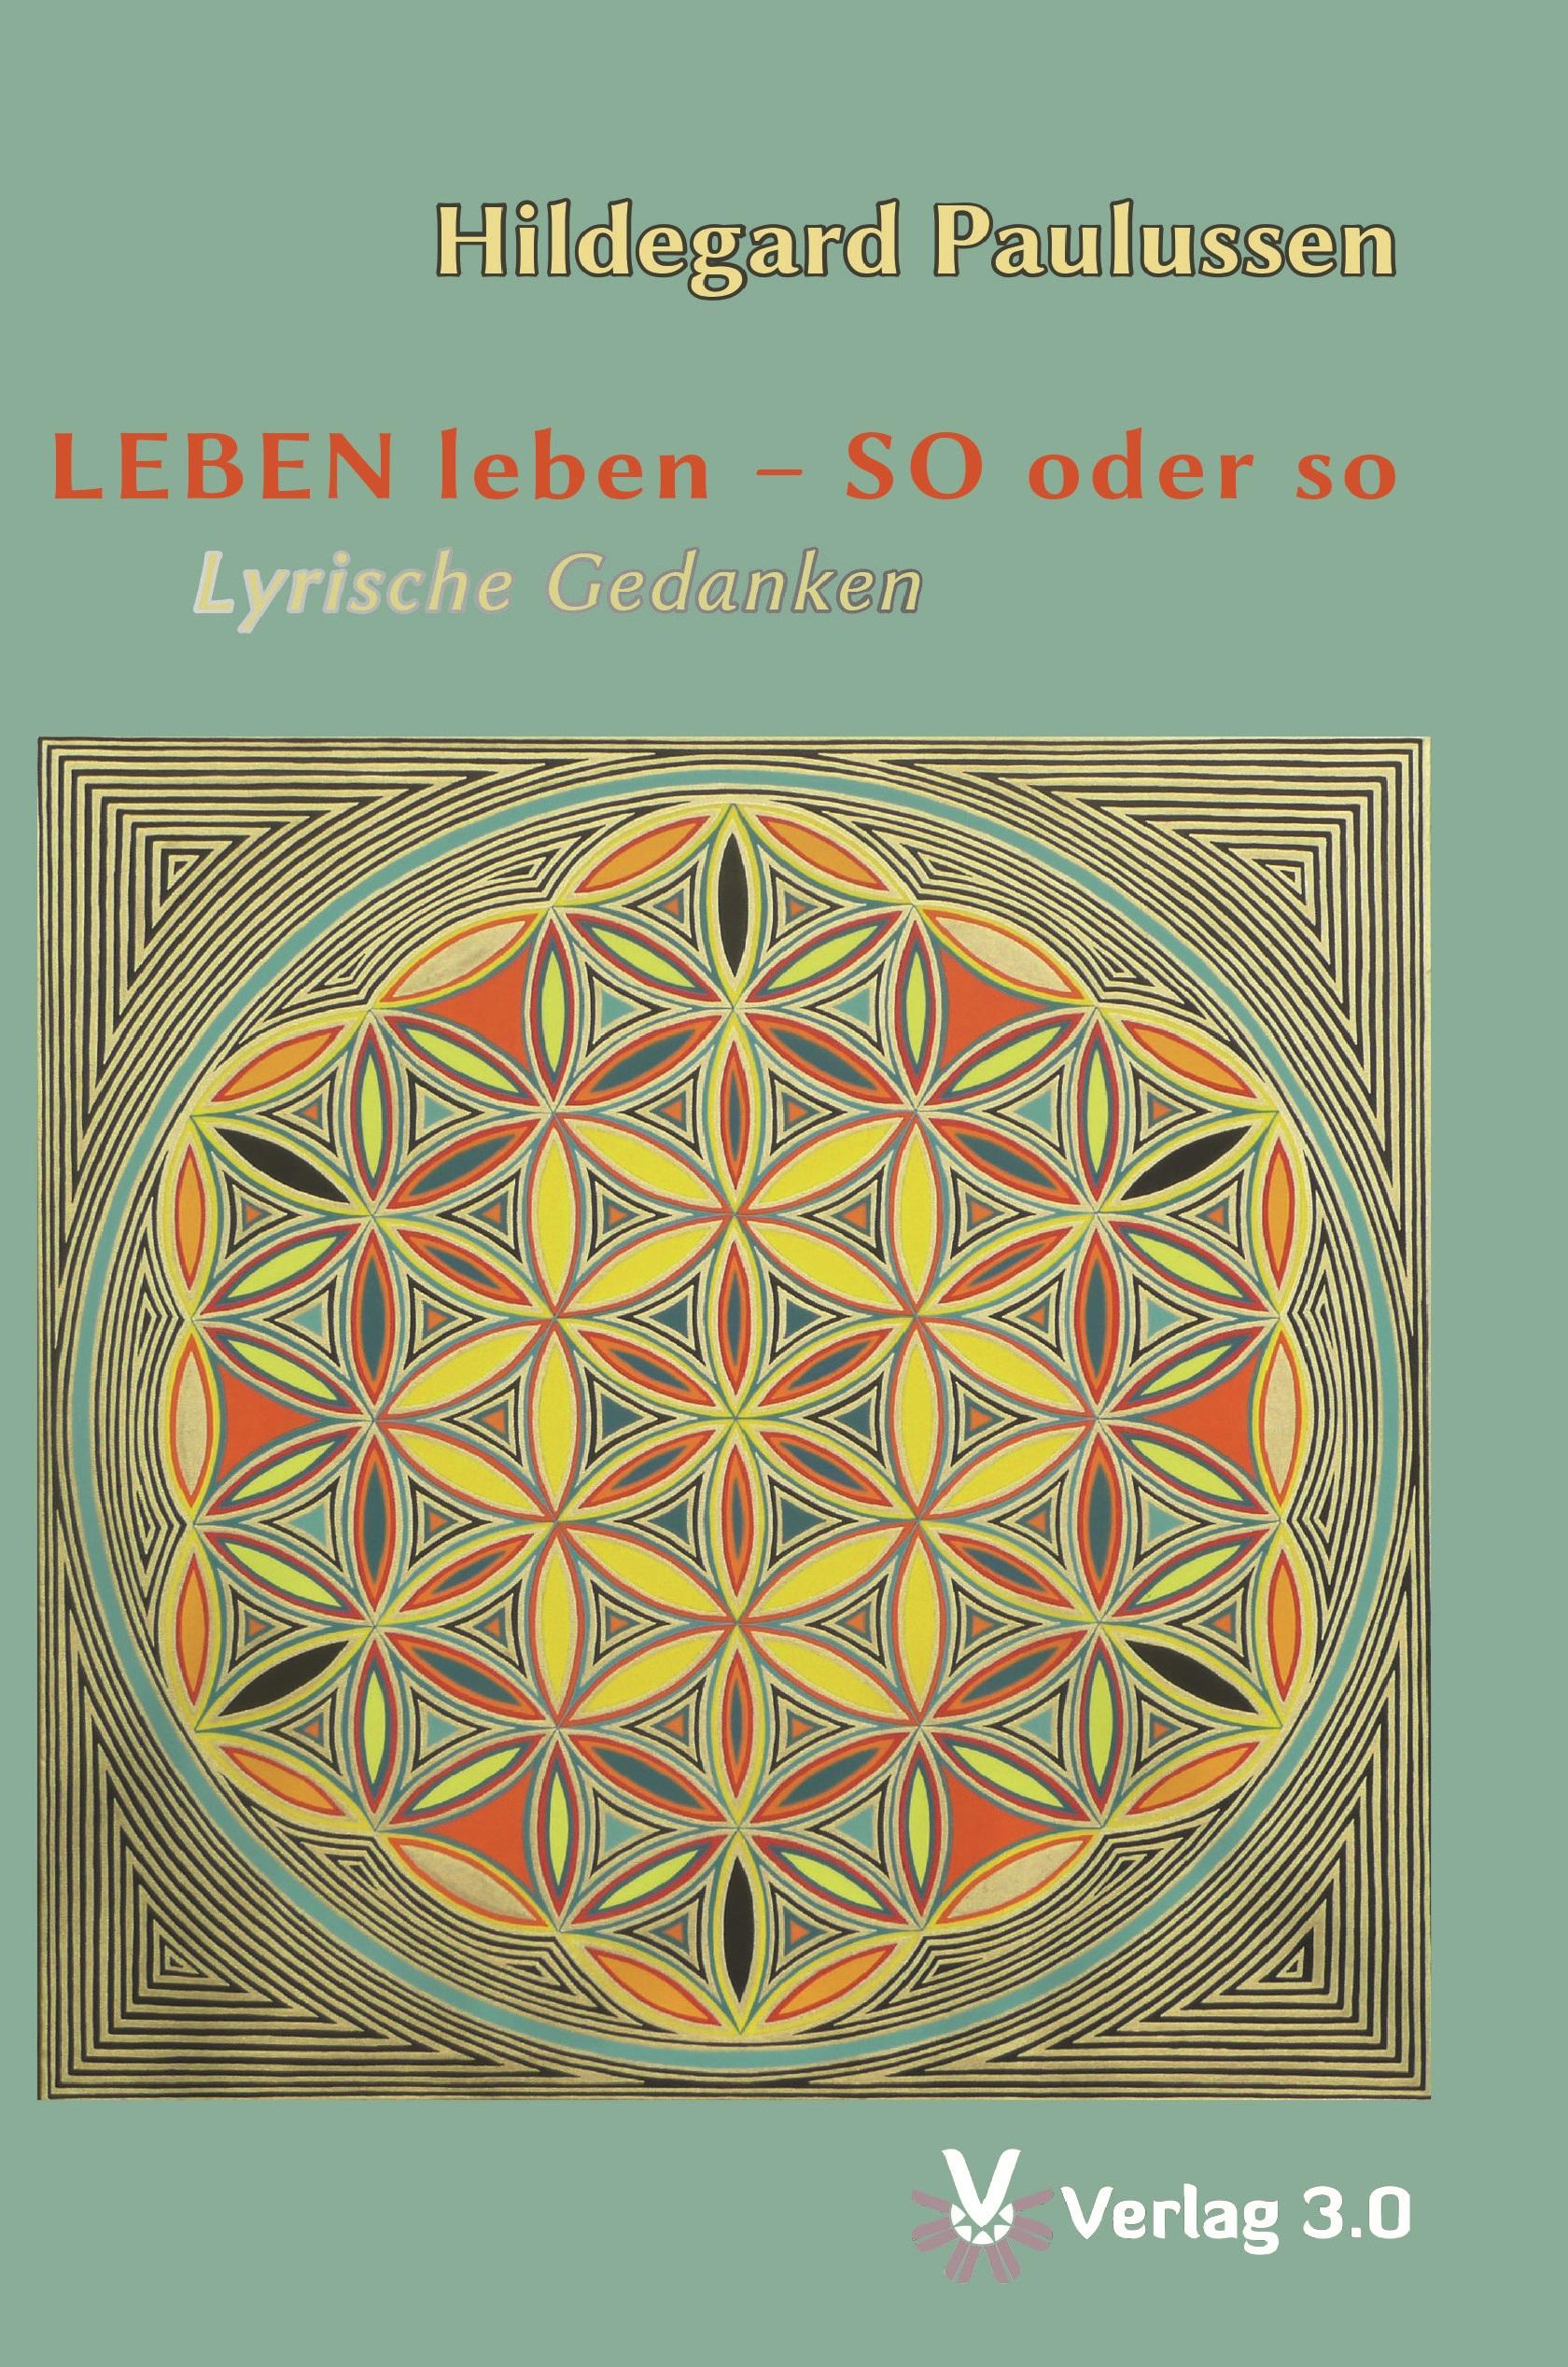 цена Hildegard Paulussen LEBEN leben - SO oder so онлайн в 2017 году